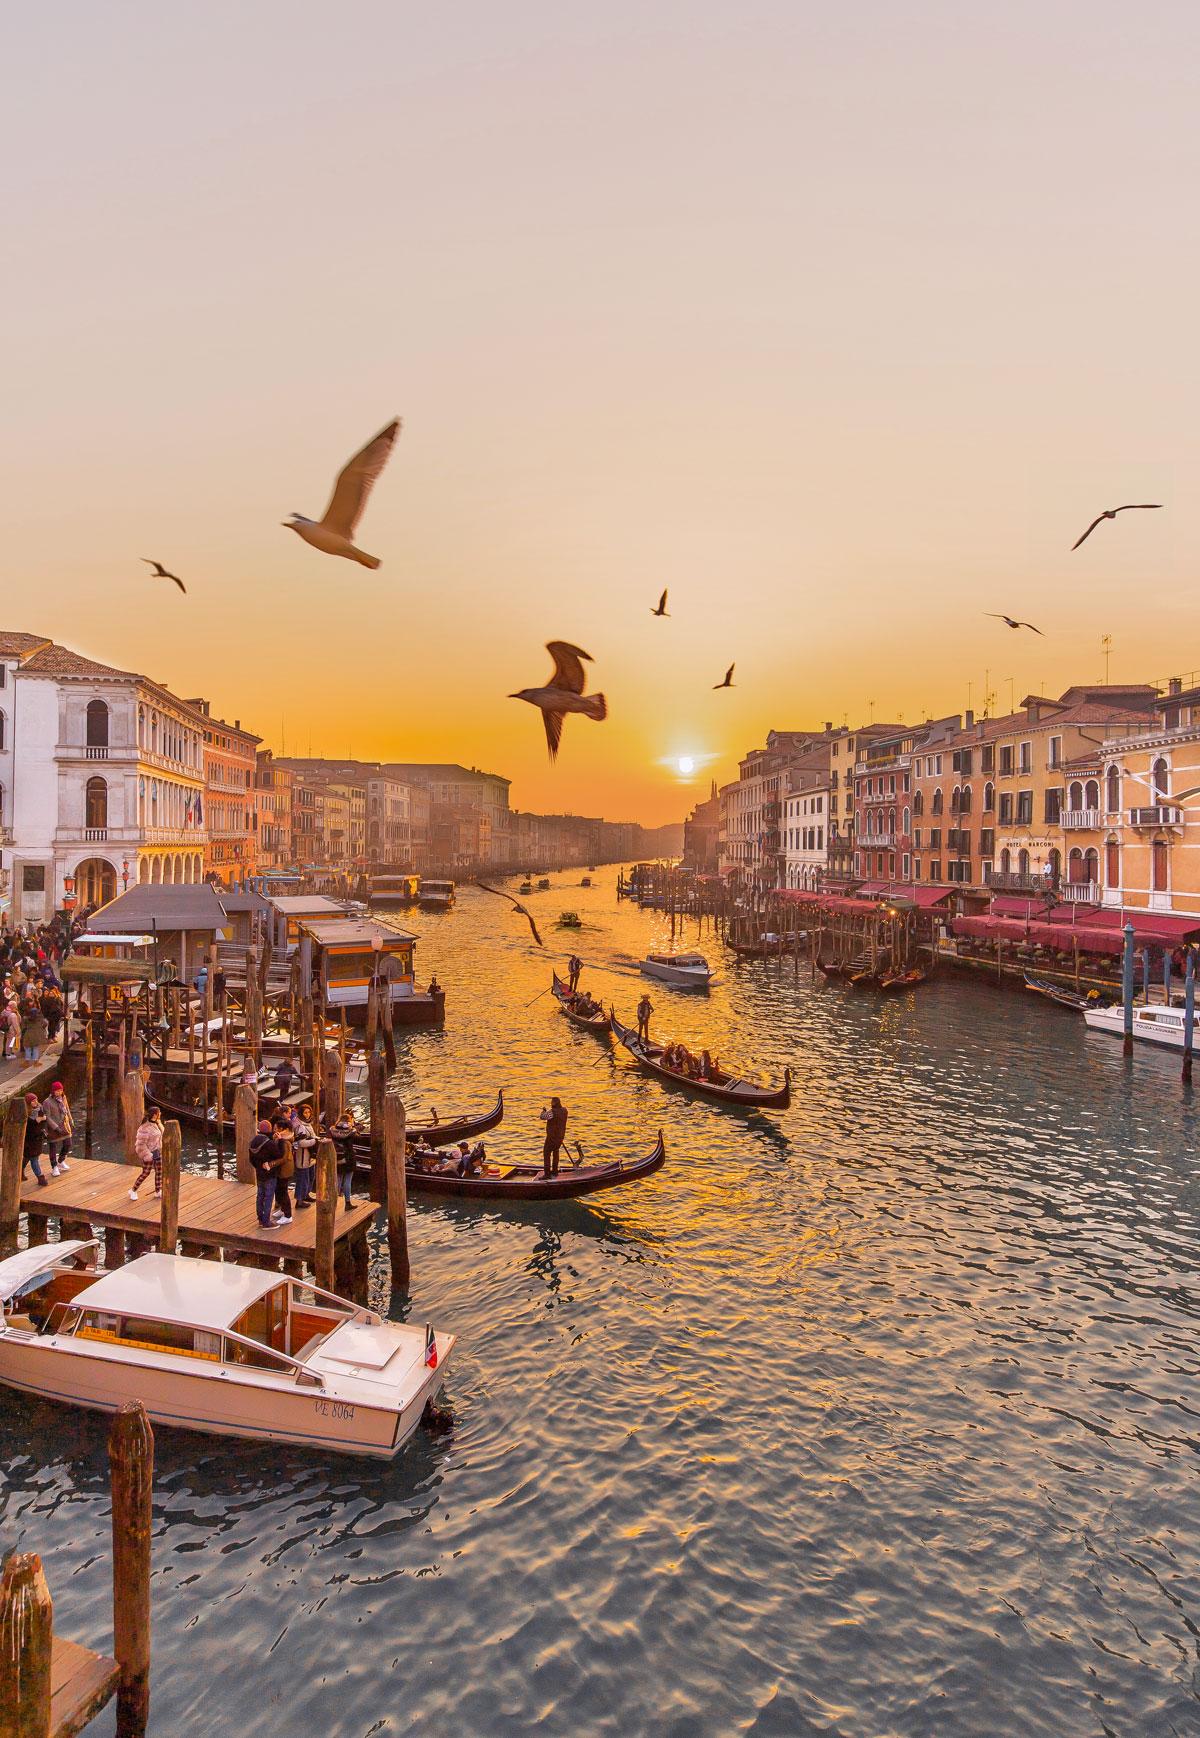 top things to do in Venice - Venice Instagram spots – Venice bucket list - kelseyinlondon - kelsey heinrichs - venice gondola ride - venice grand canal - venice instagram spots